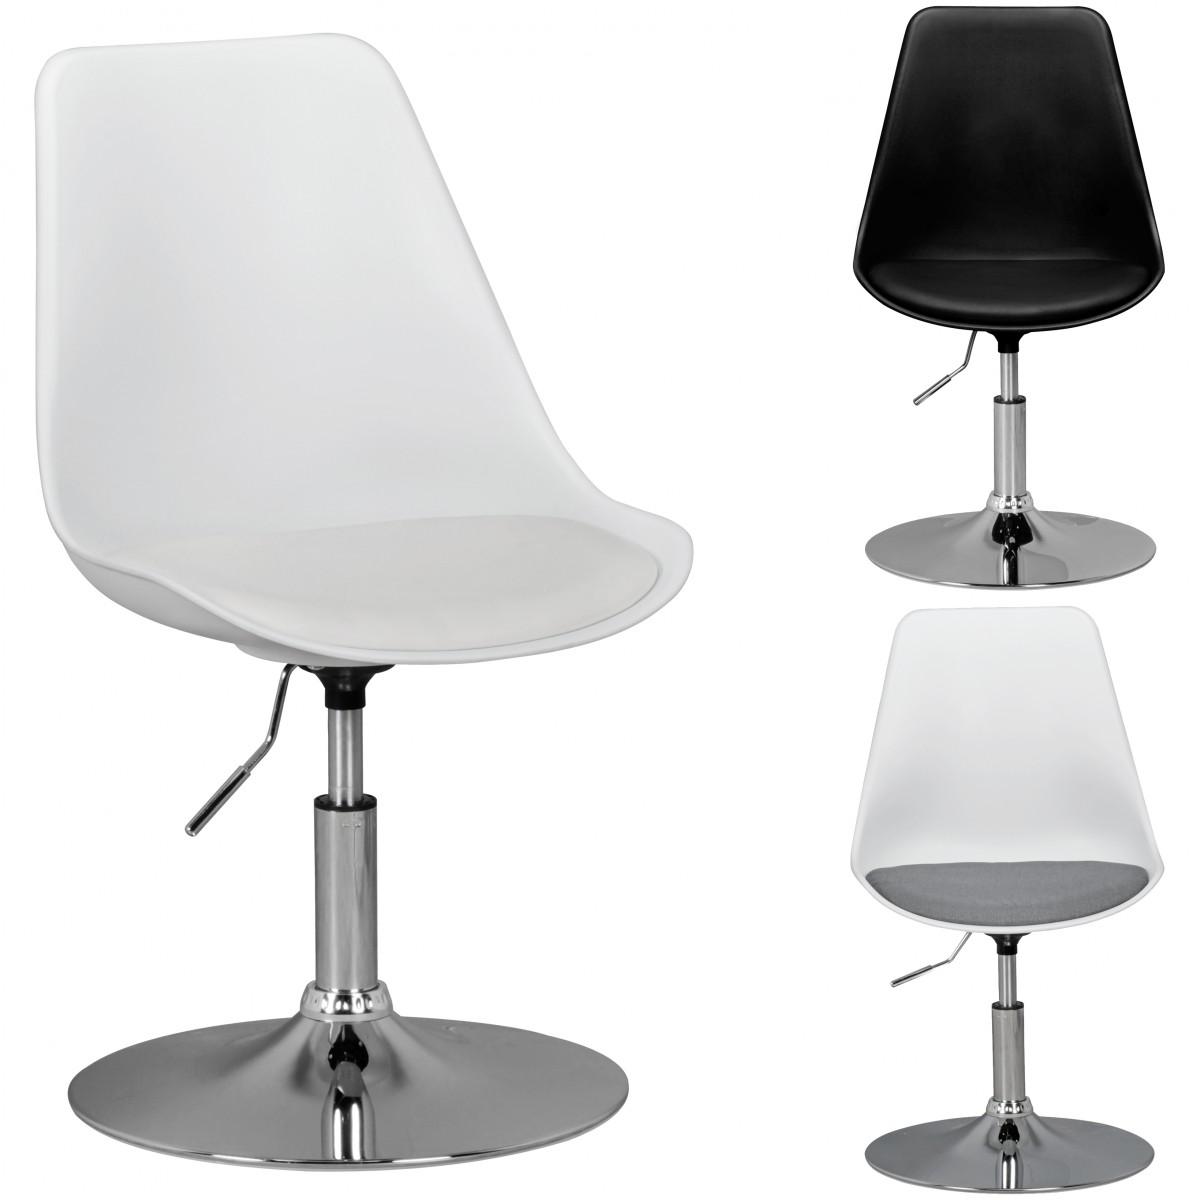 drehsessel h henverstellbar design drehstuhl esszimmerstuhl drehbar sessel ebay. Black Bedroom Furniture Sets. Home Design Ideas